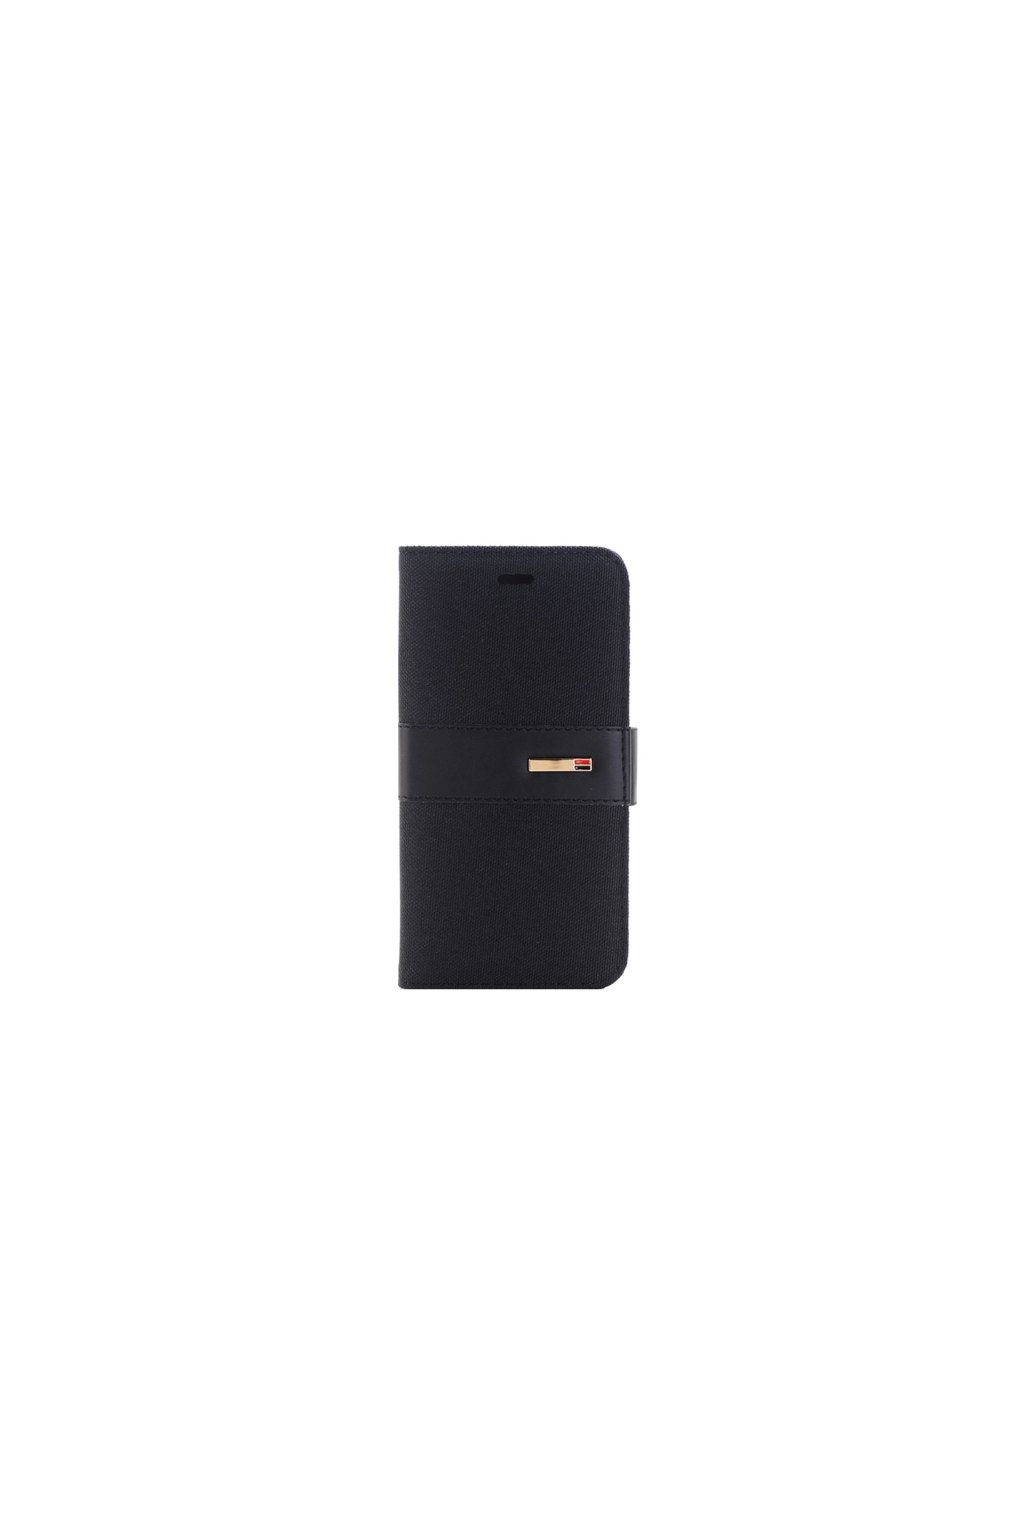 Apple iPhone 6/6S pouzdro flip DENIM, Black